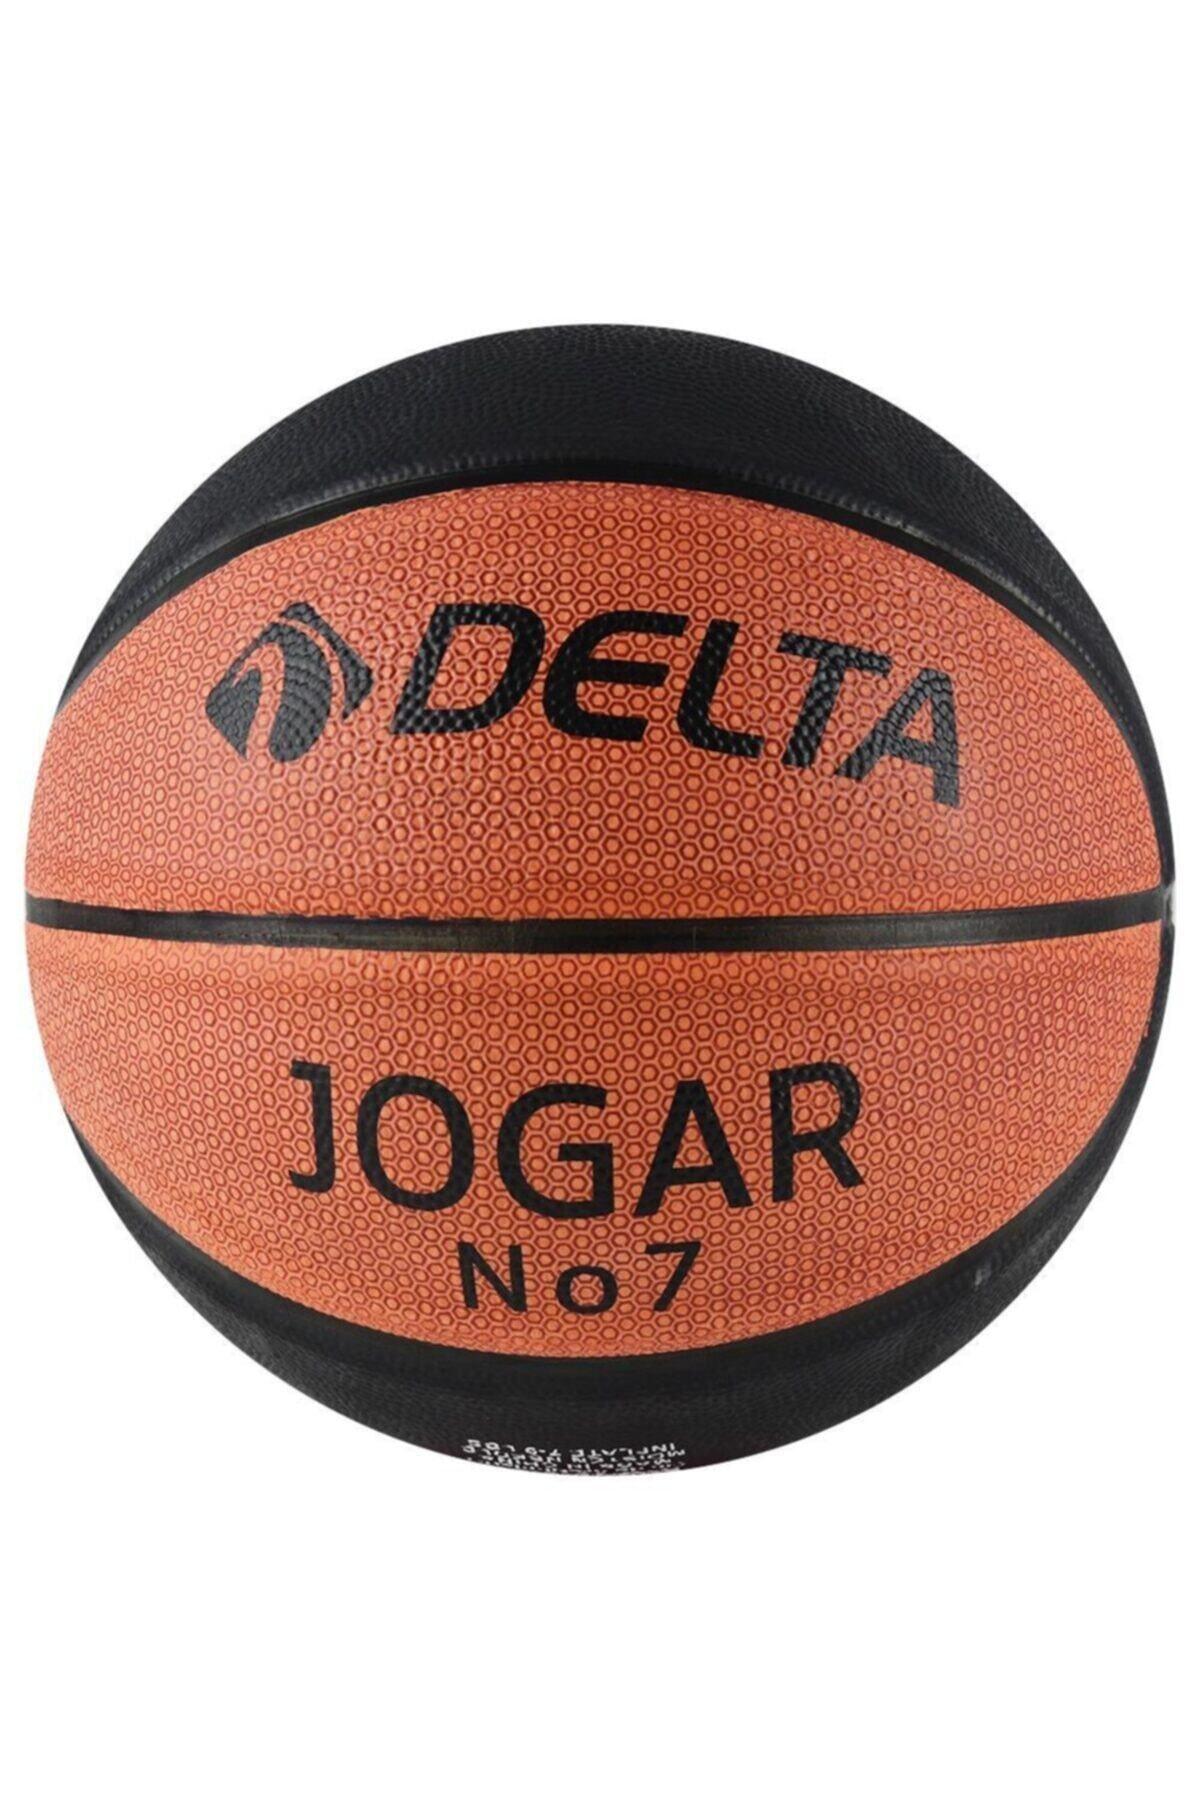 Jogar Deluxe Dura-Strong 7 Numara Basketbol Topu